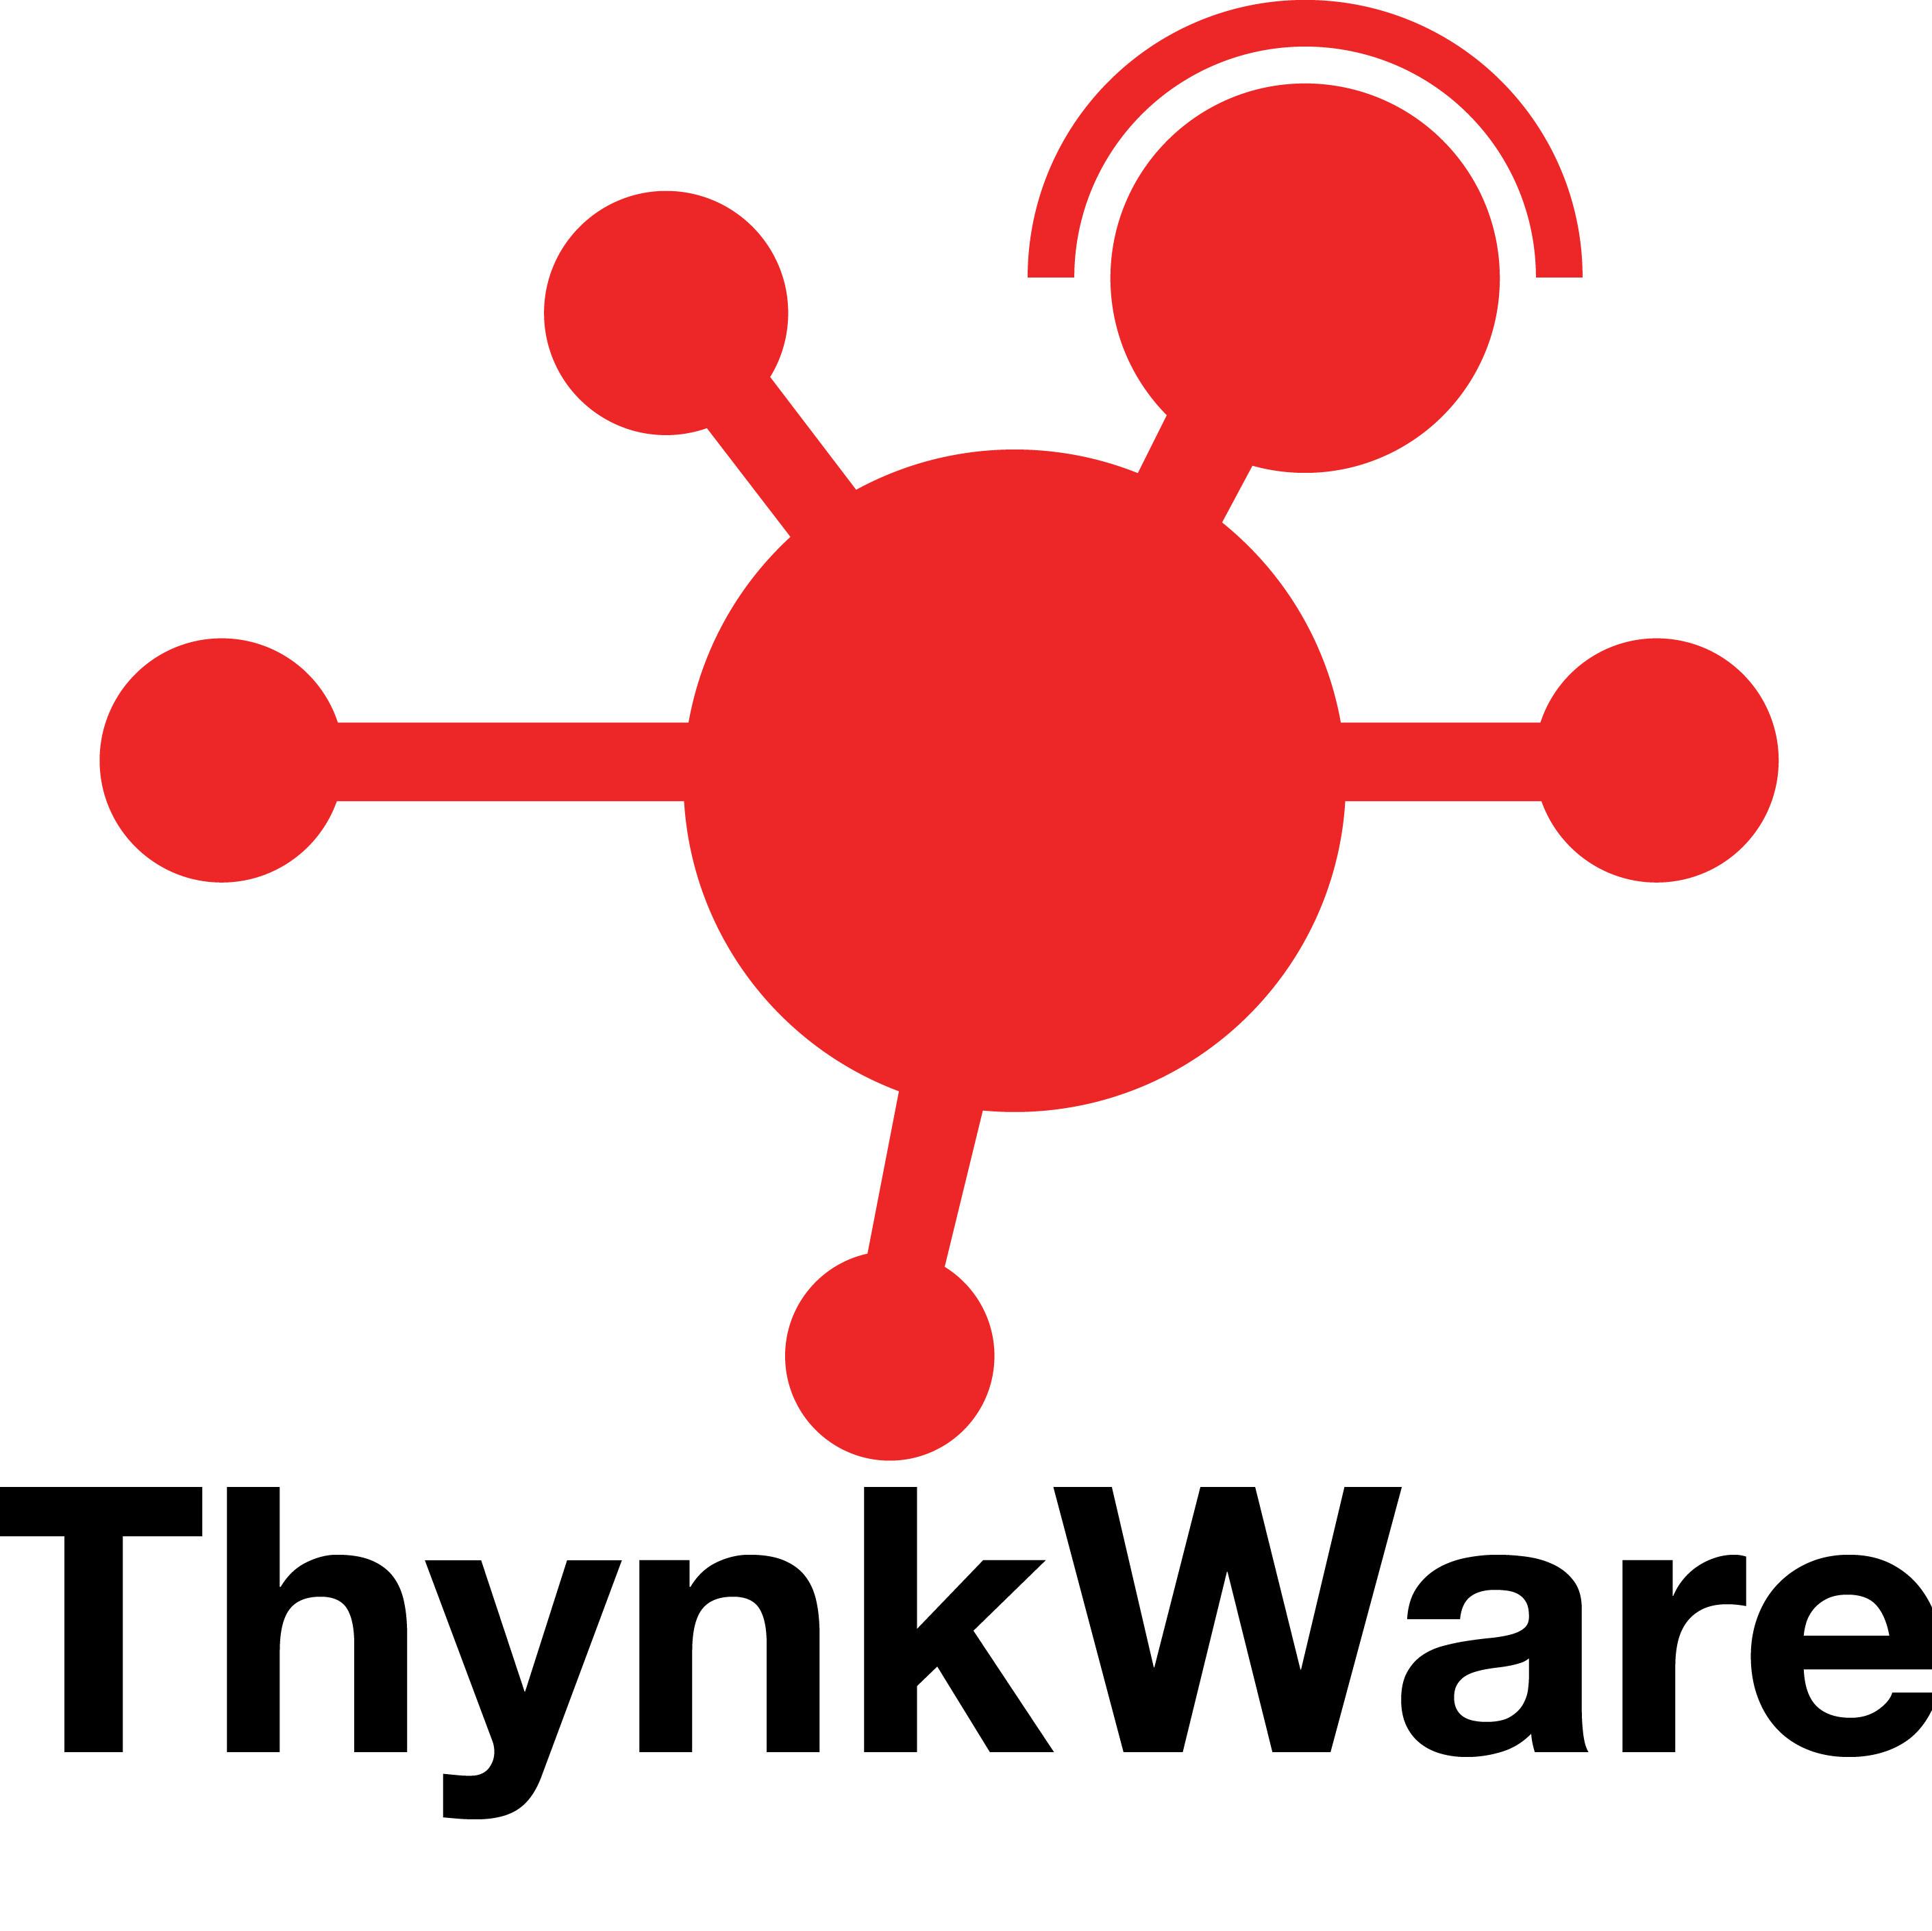 ThynkWare